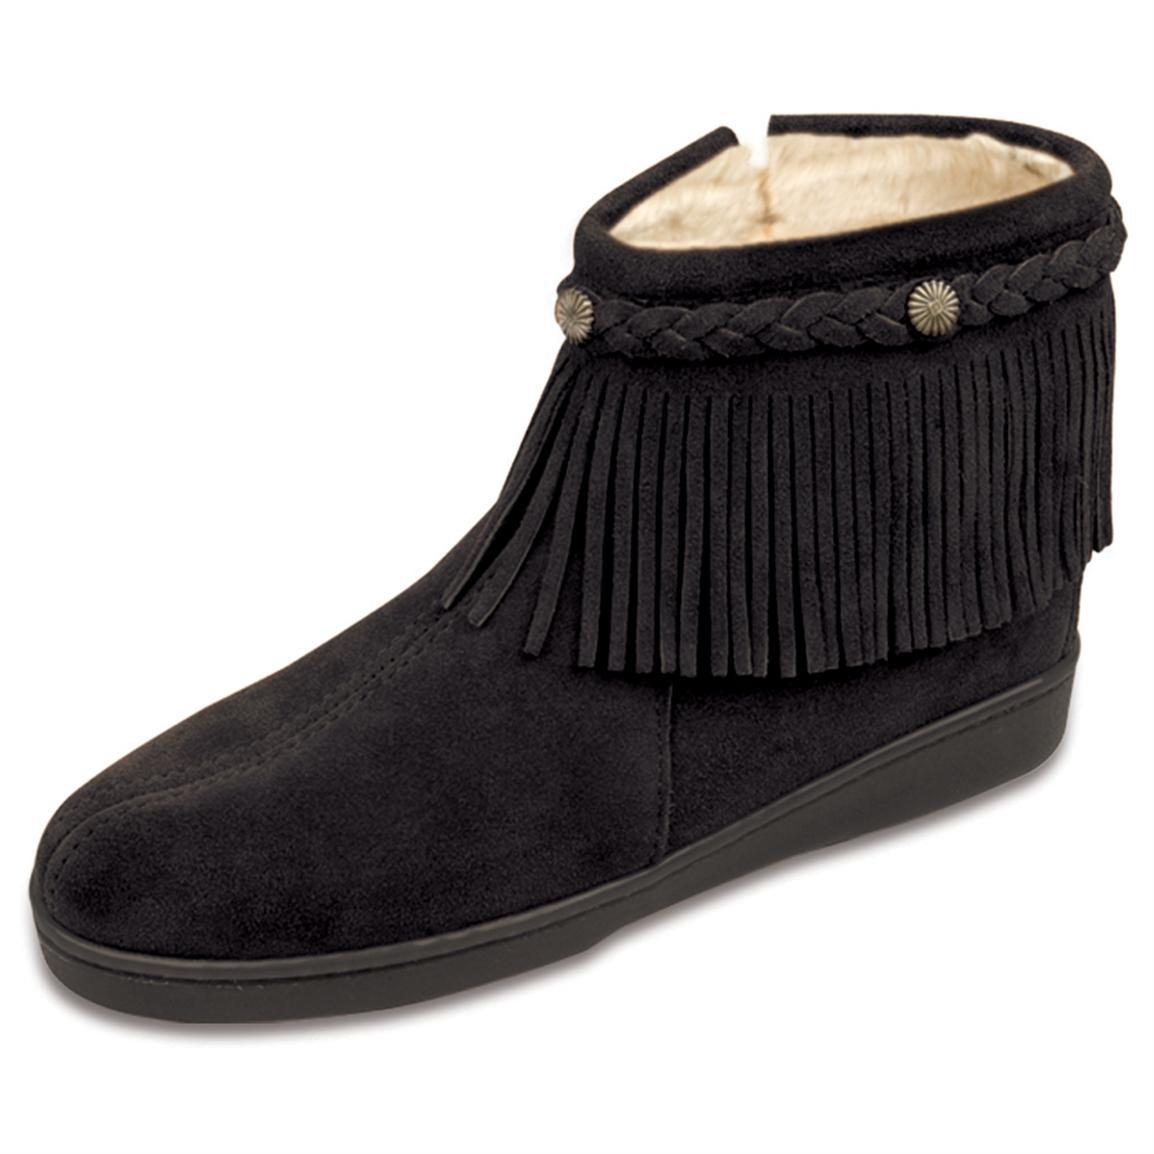 ankle black fringe moccasin bootsWomens Minnetonka Moccasin   Pile Lined Fringe Side zip Ankle TQCvzwm2